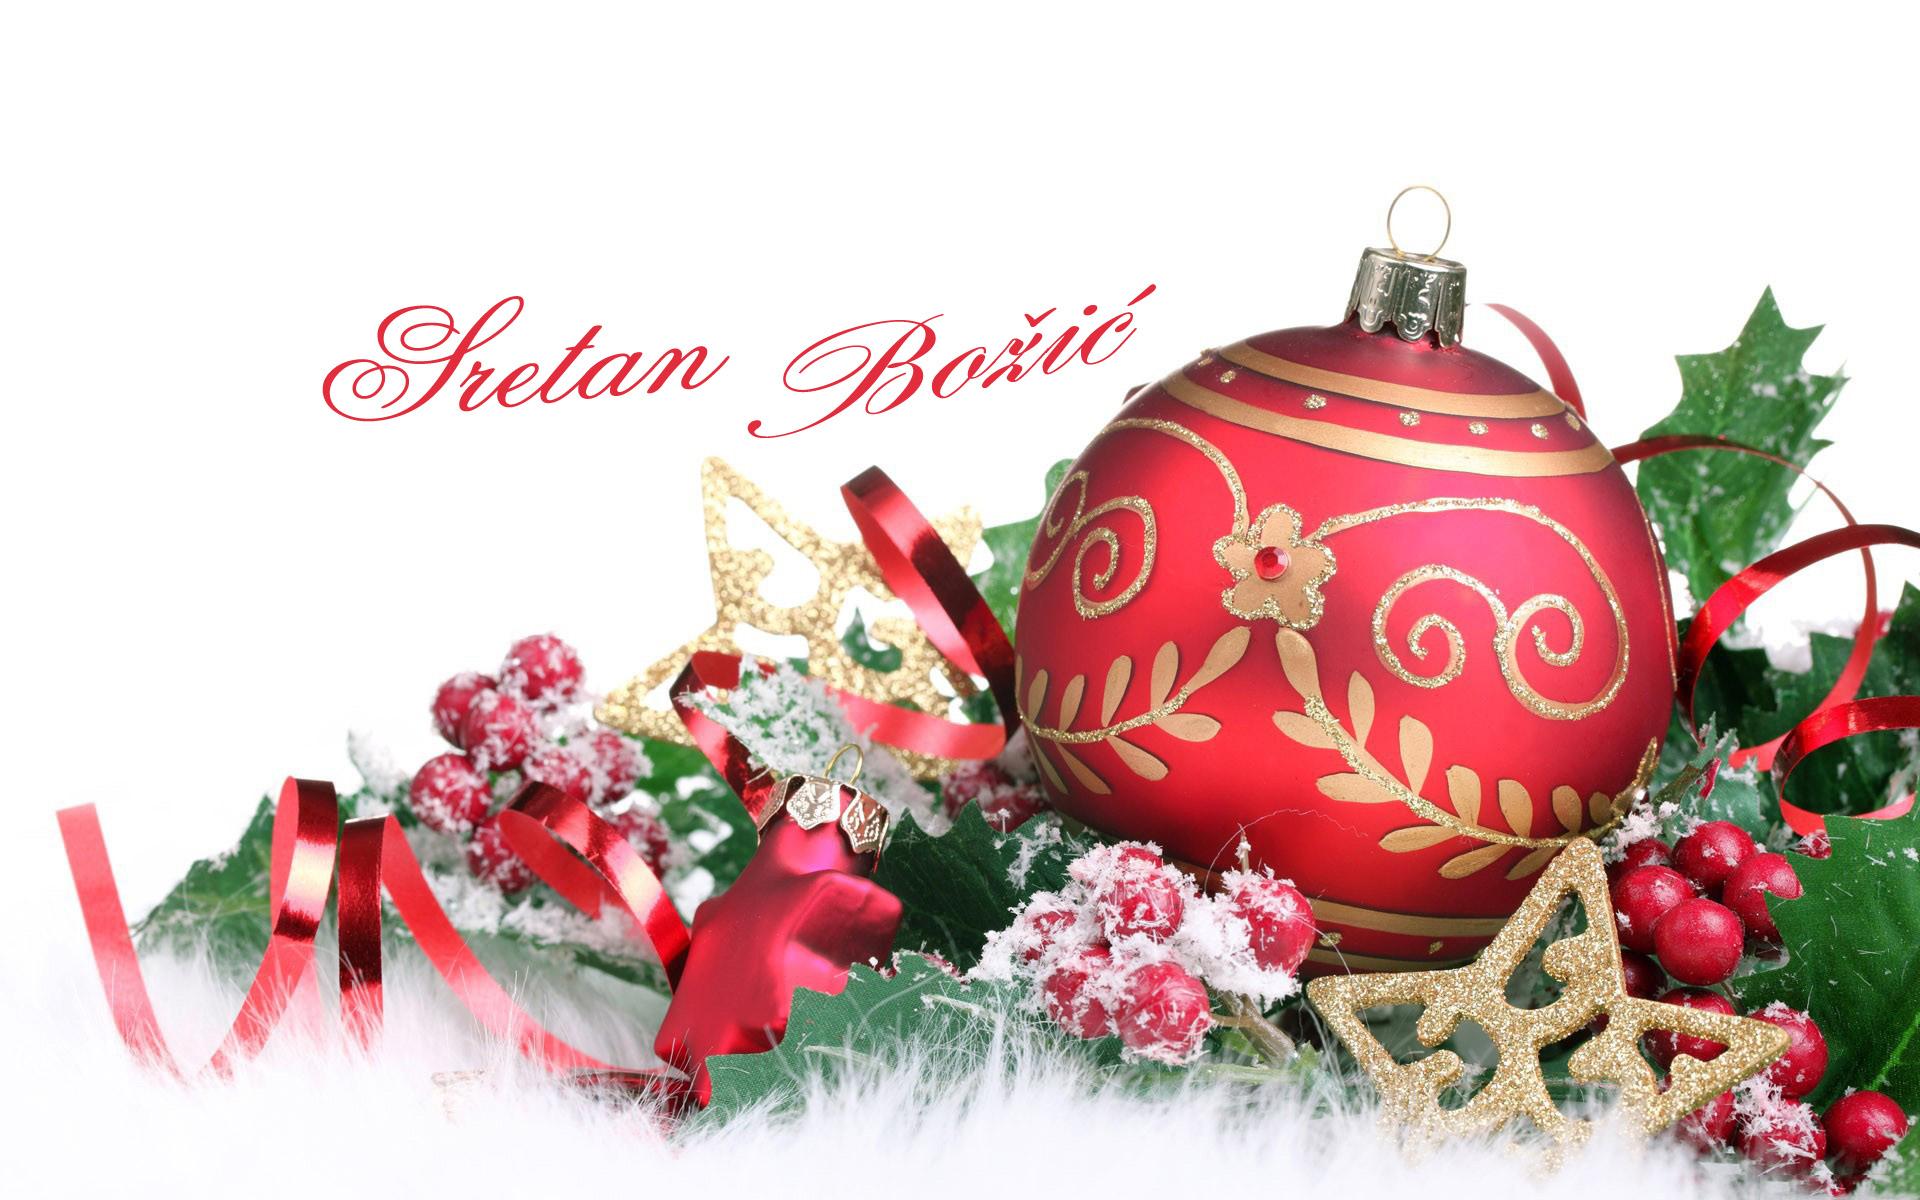 blusrcu.ba-Sretan Božić